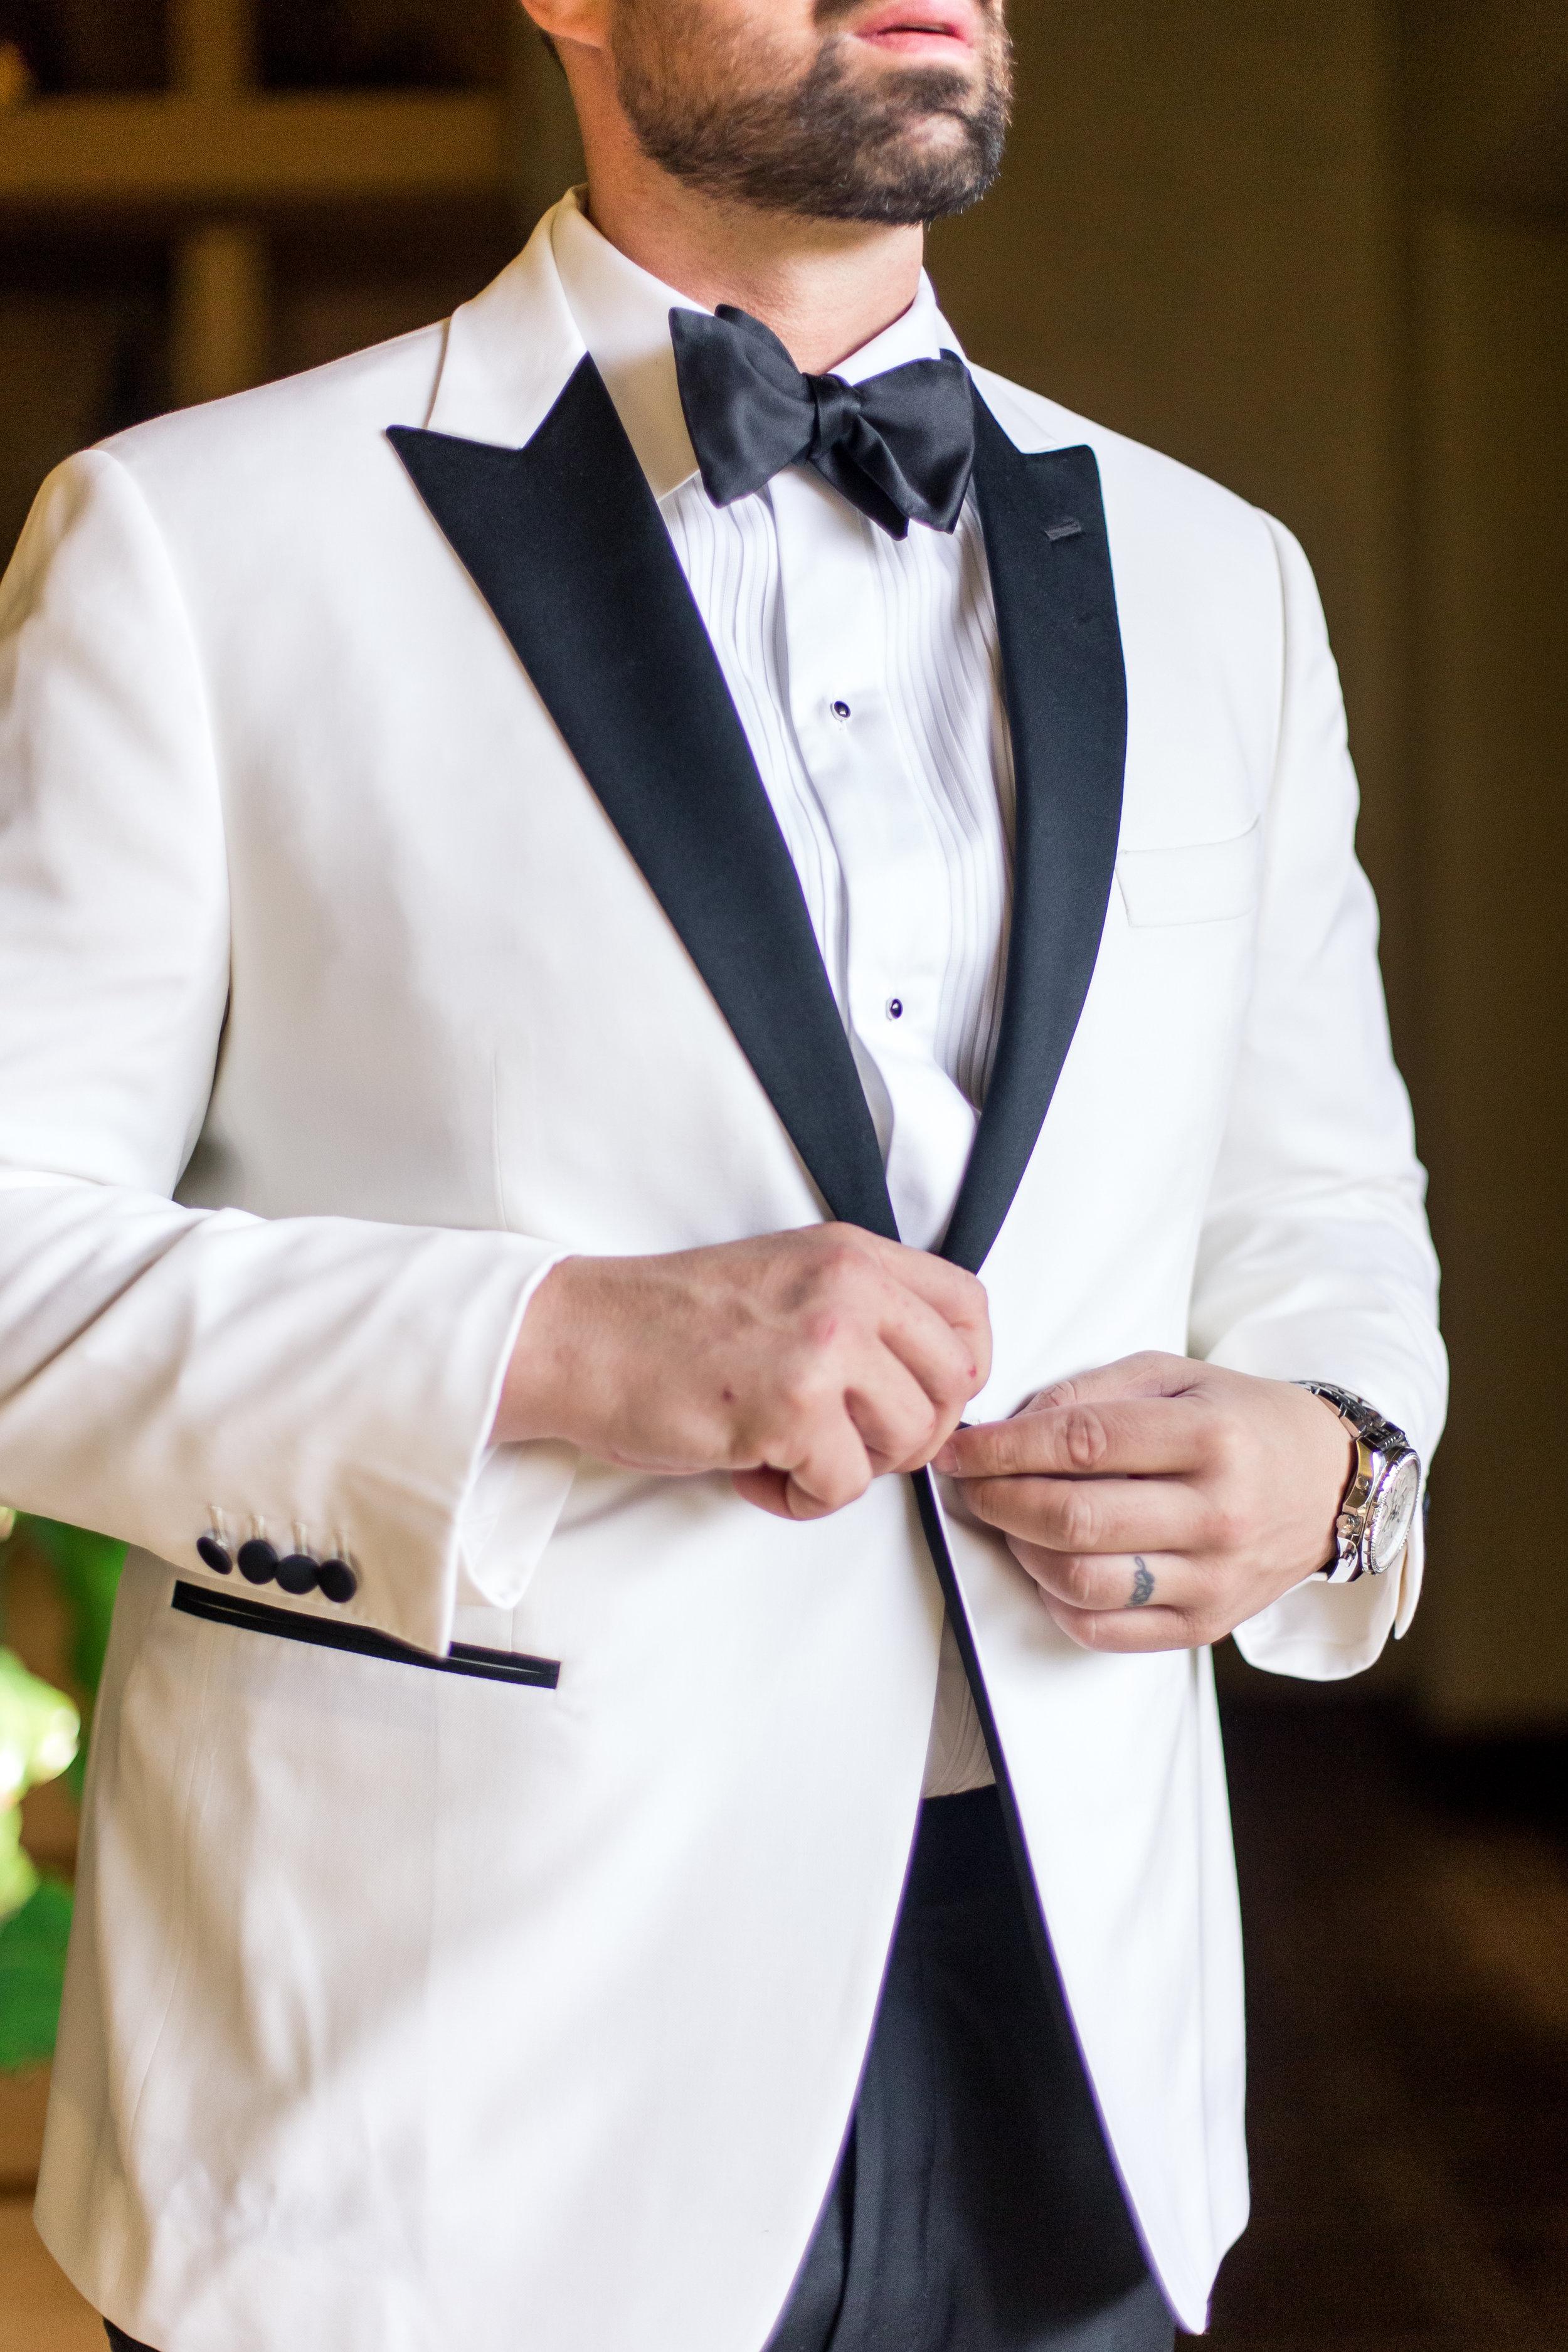 groom-in-white-tux-las-vegas-wedding-planner-green-orchid-events.jpg